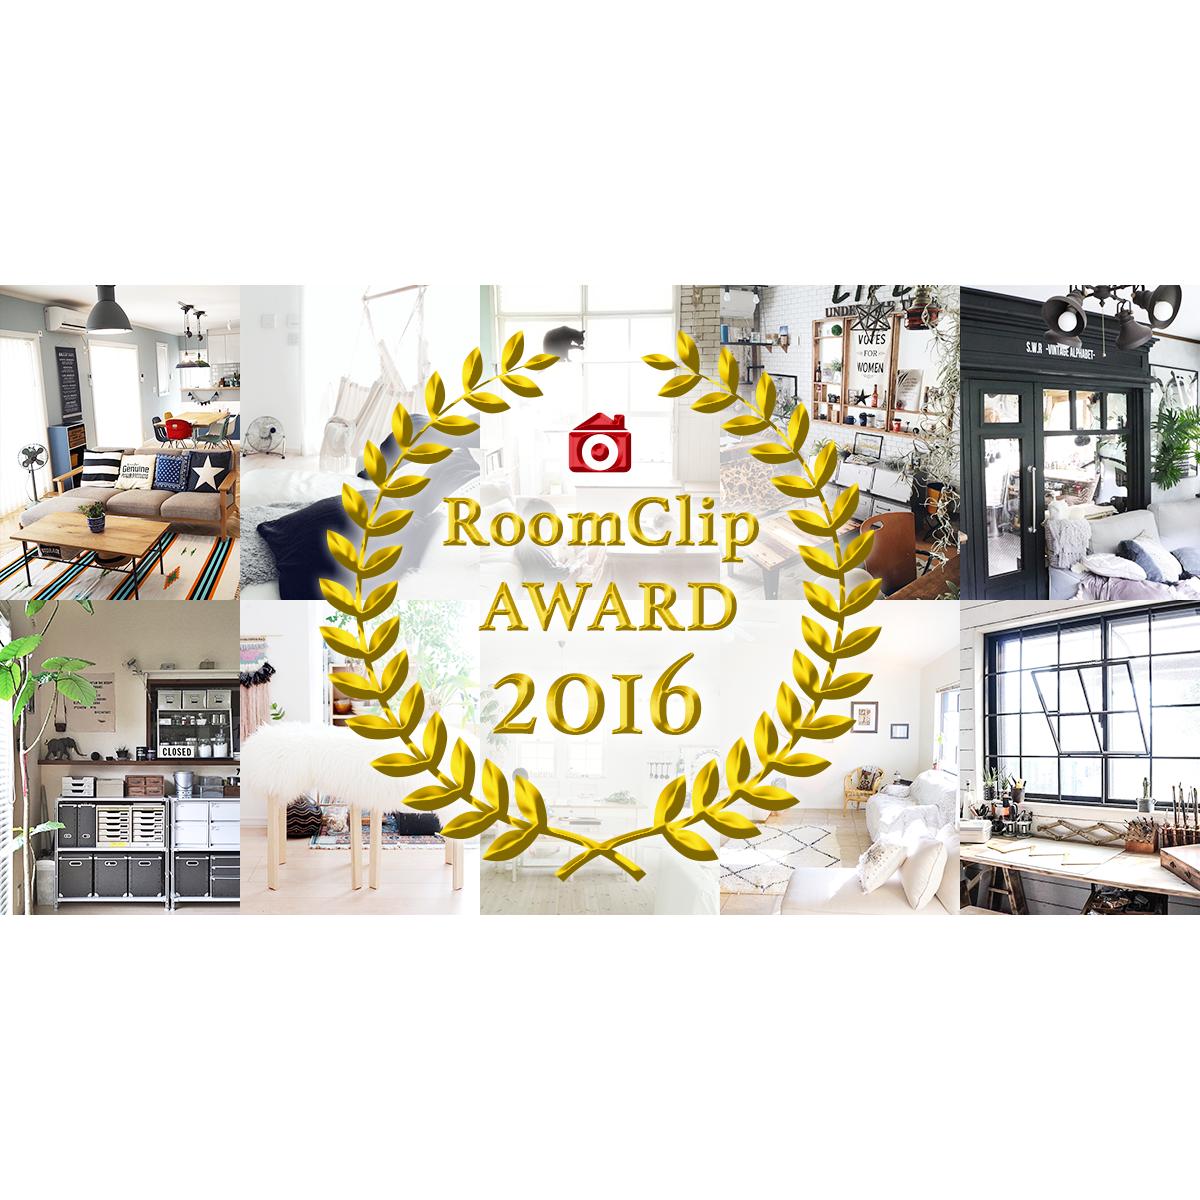 RoomClip Award 2016☆今年のインテリアトレンドを大発表!